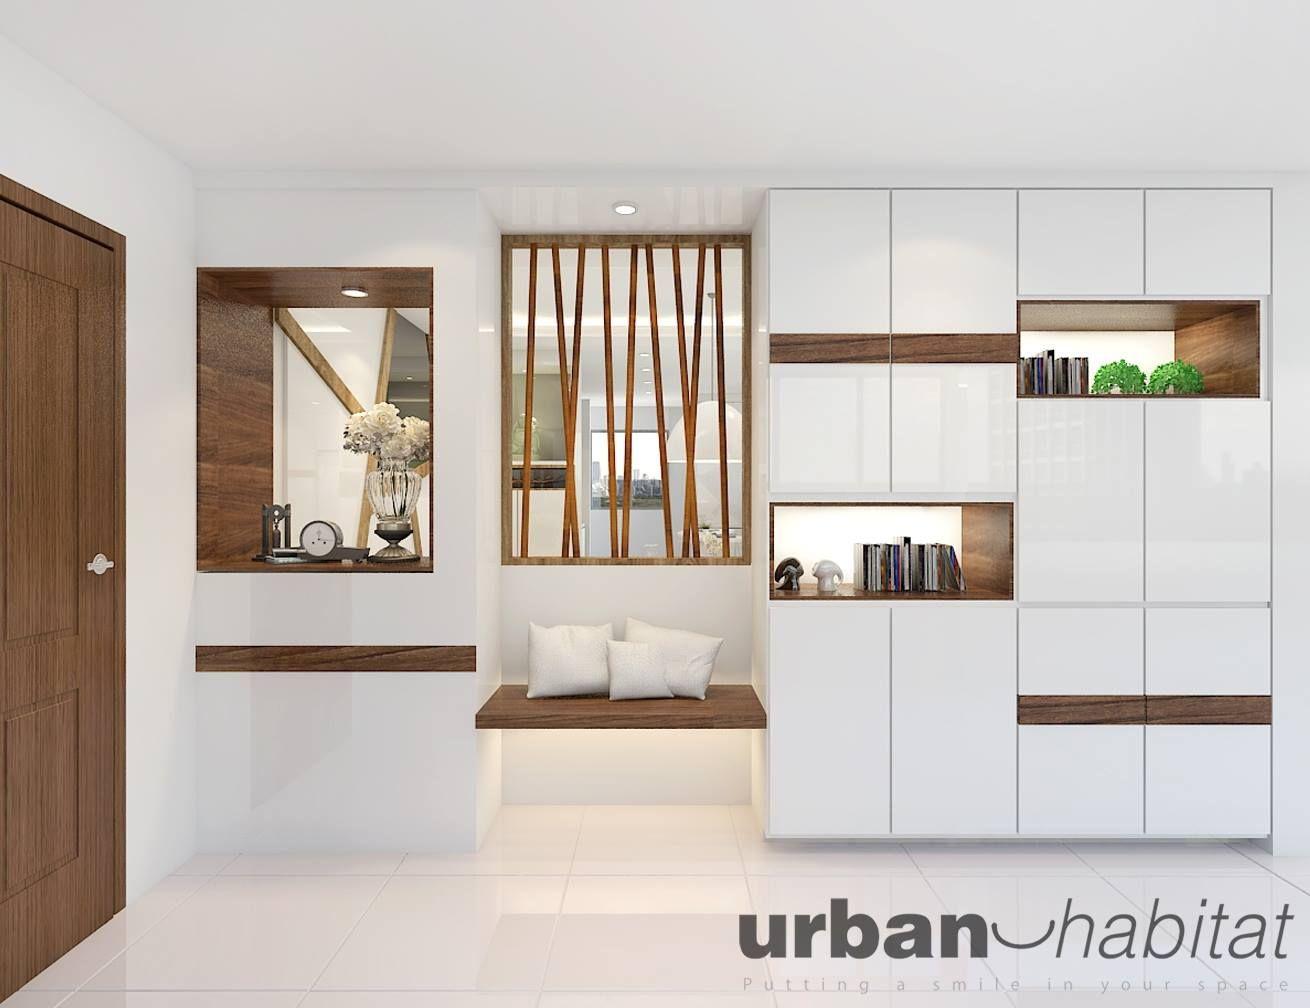 vestibule // future home | Where I Belong | Pinterest | Vestibule ...